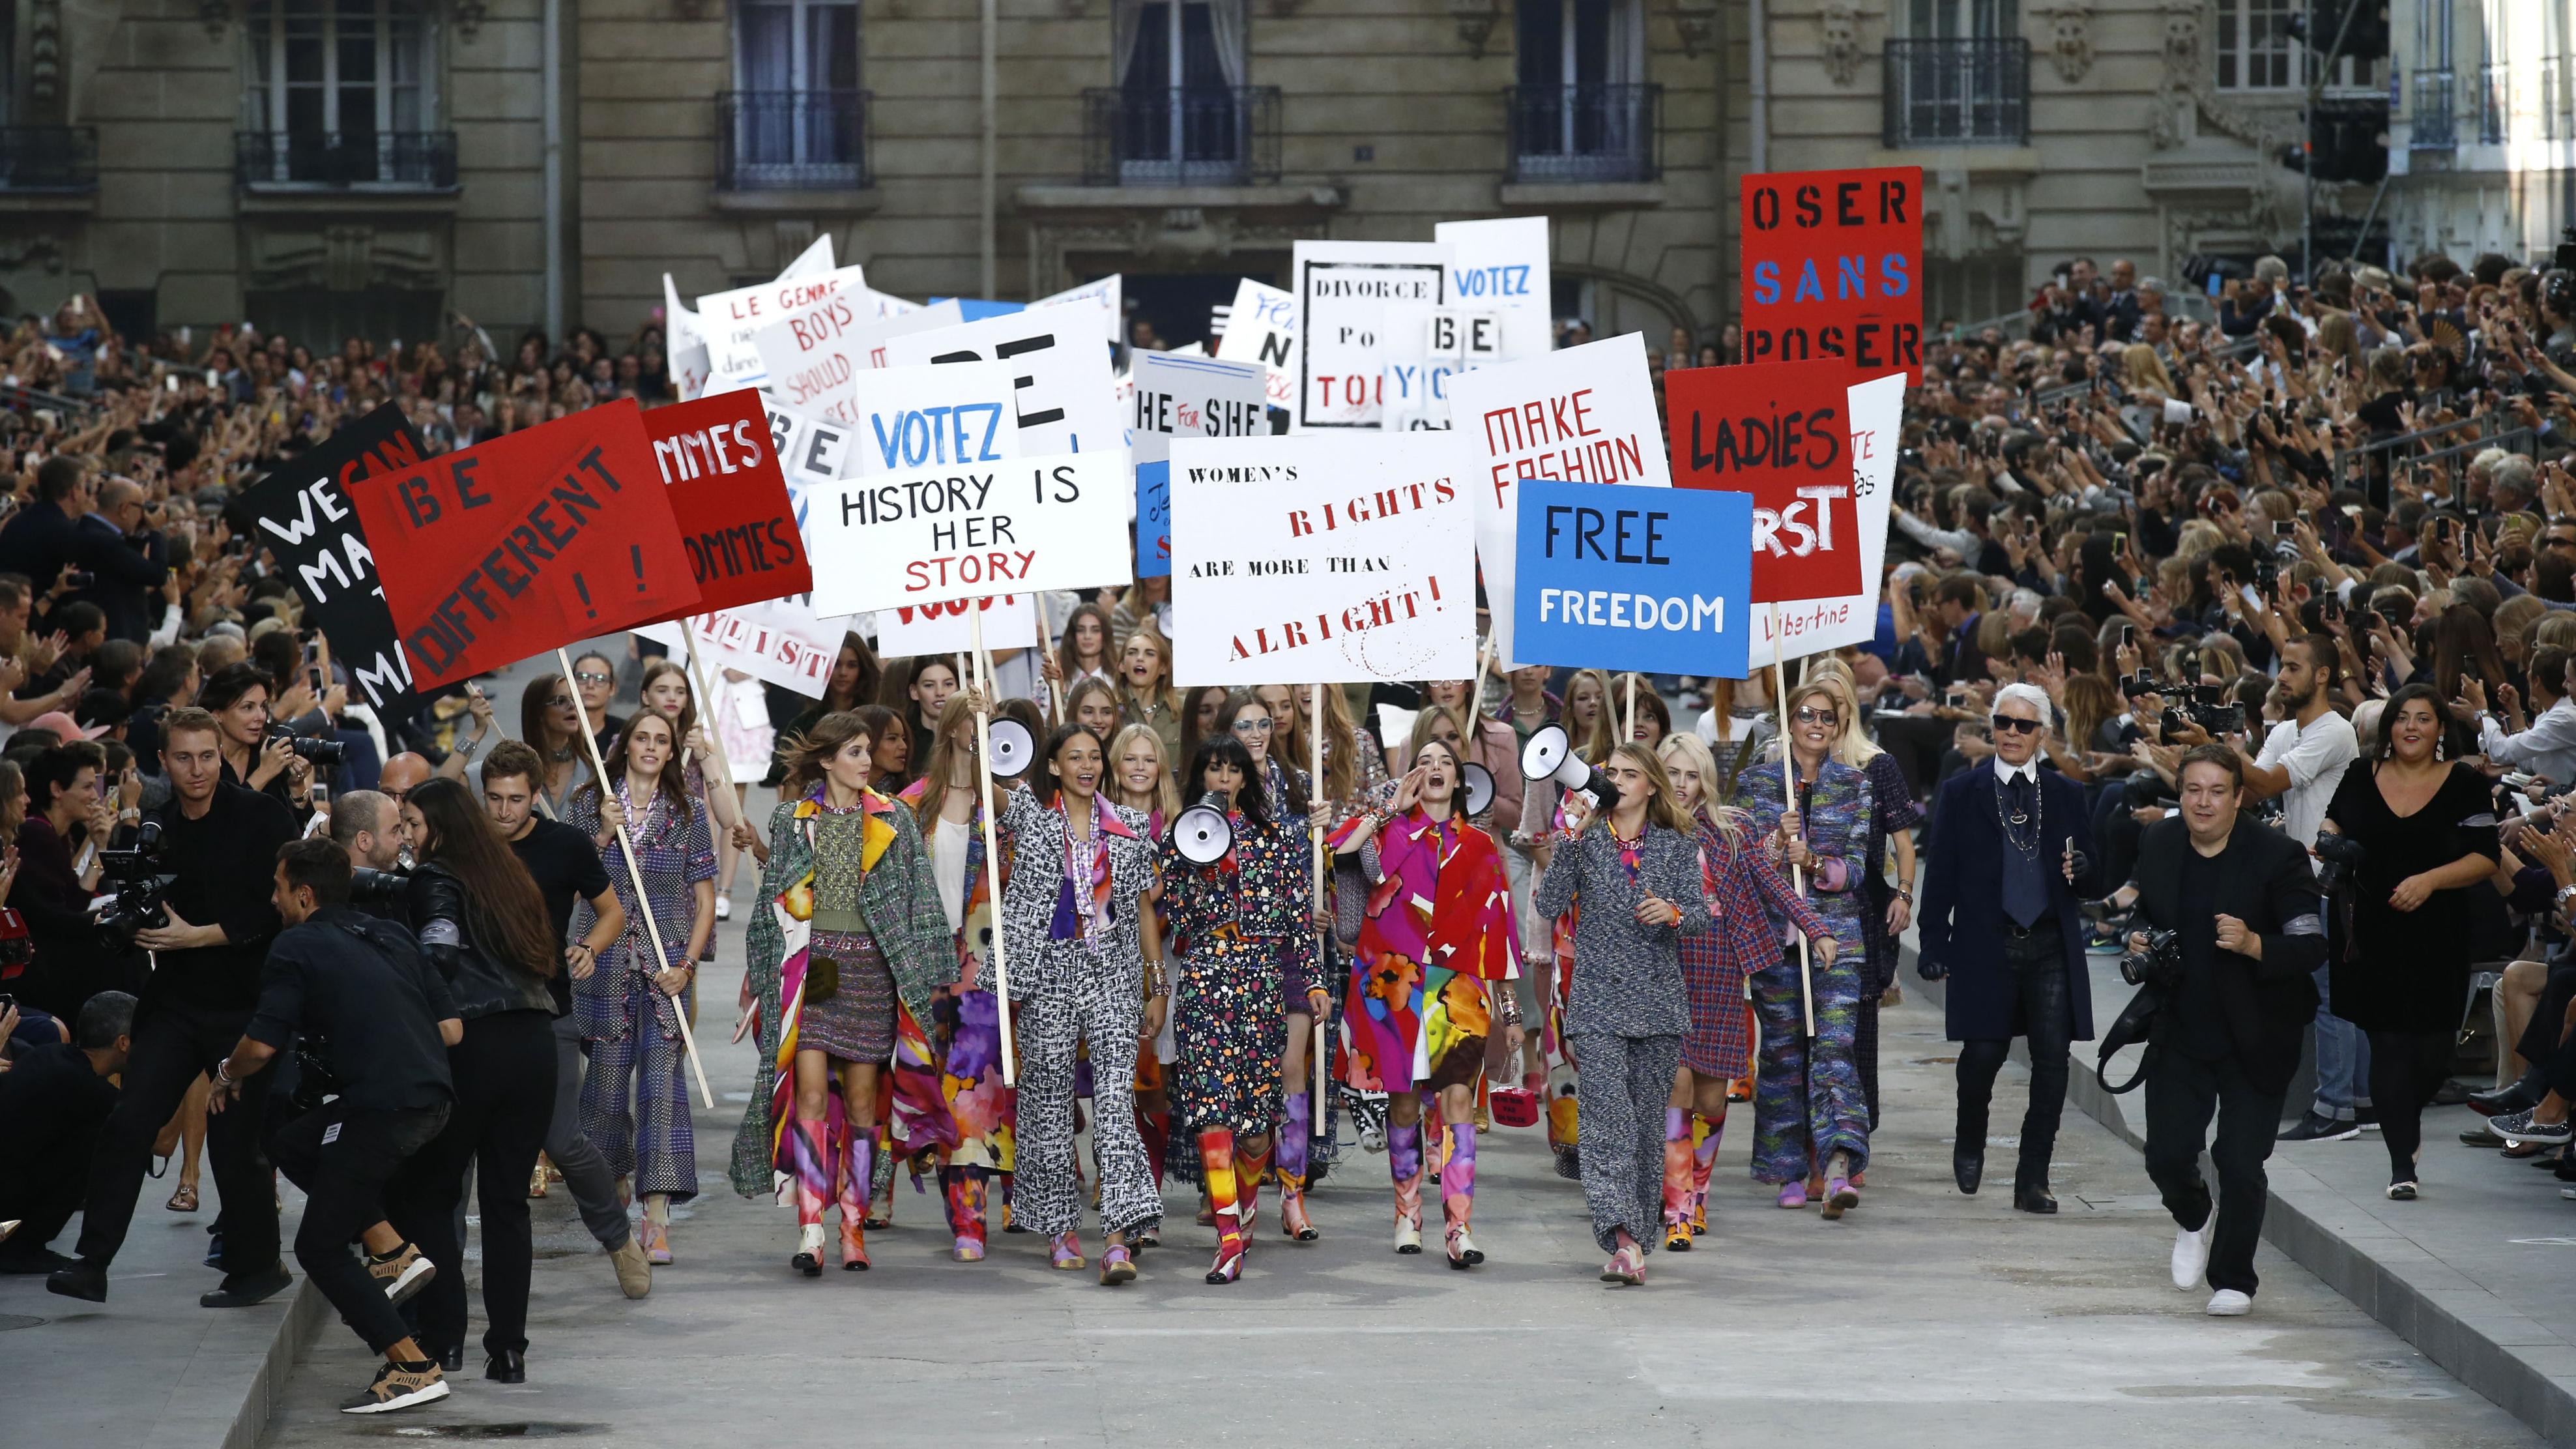 chanel spring 2015 paris fashion week protest